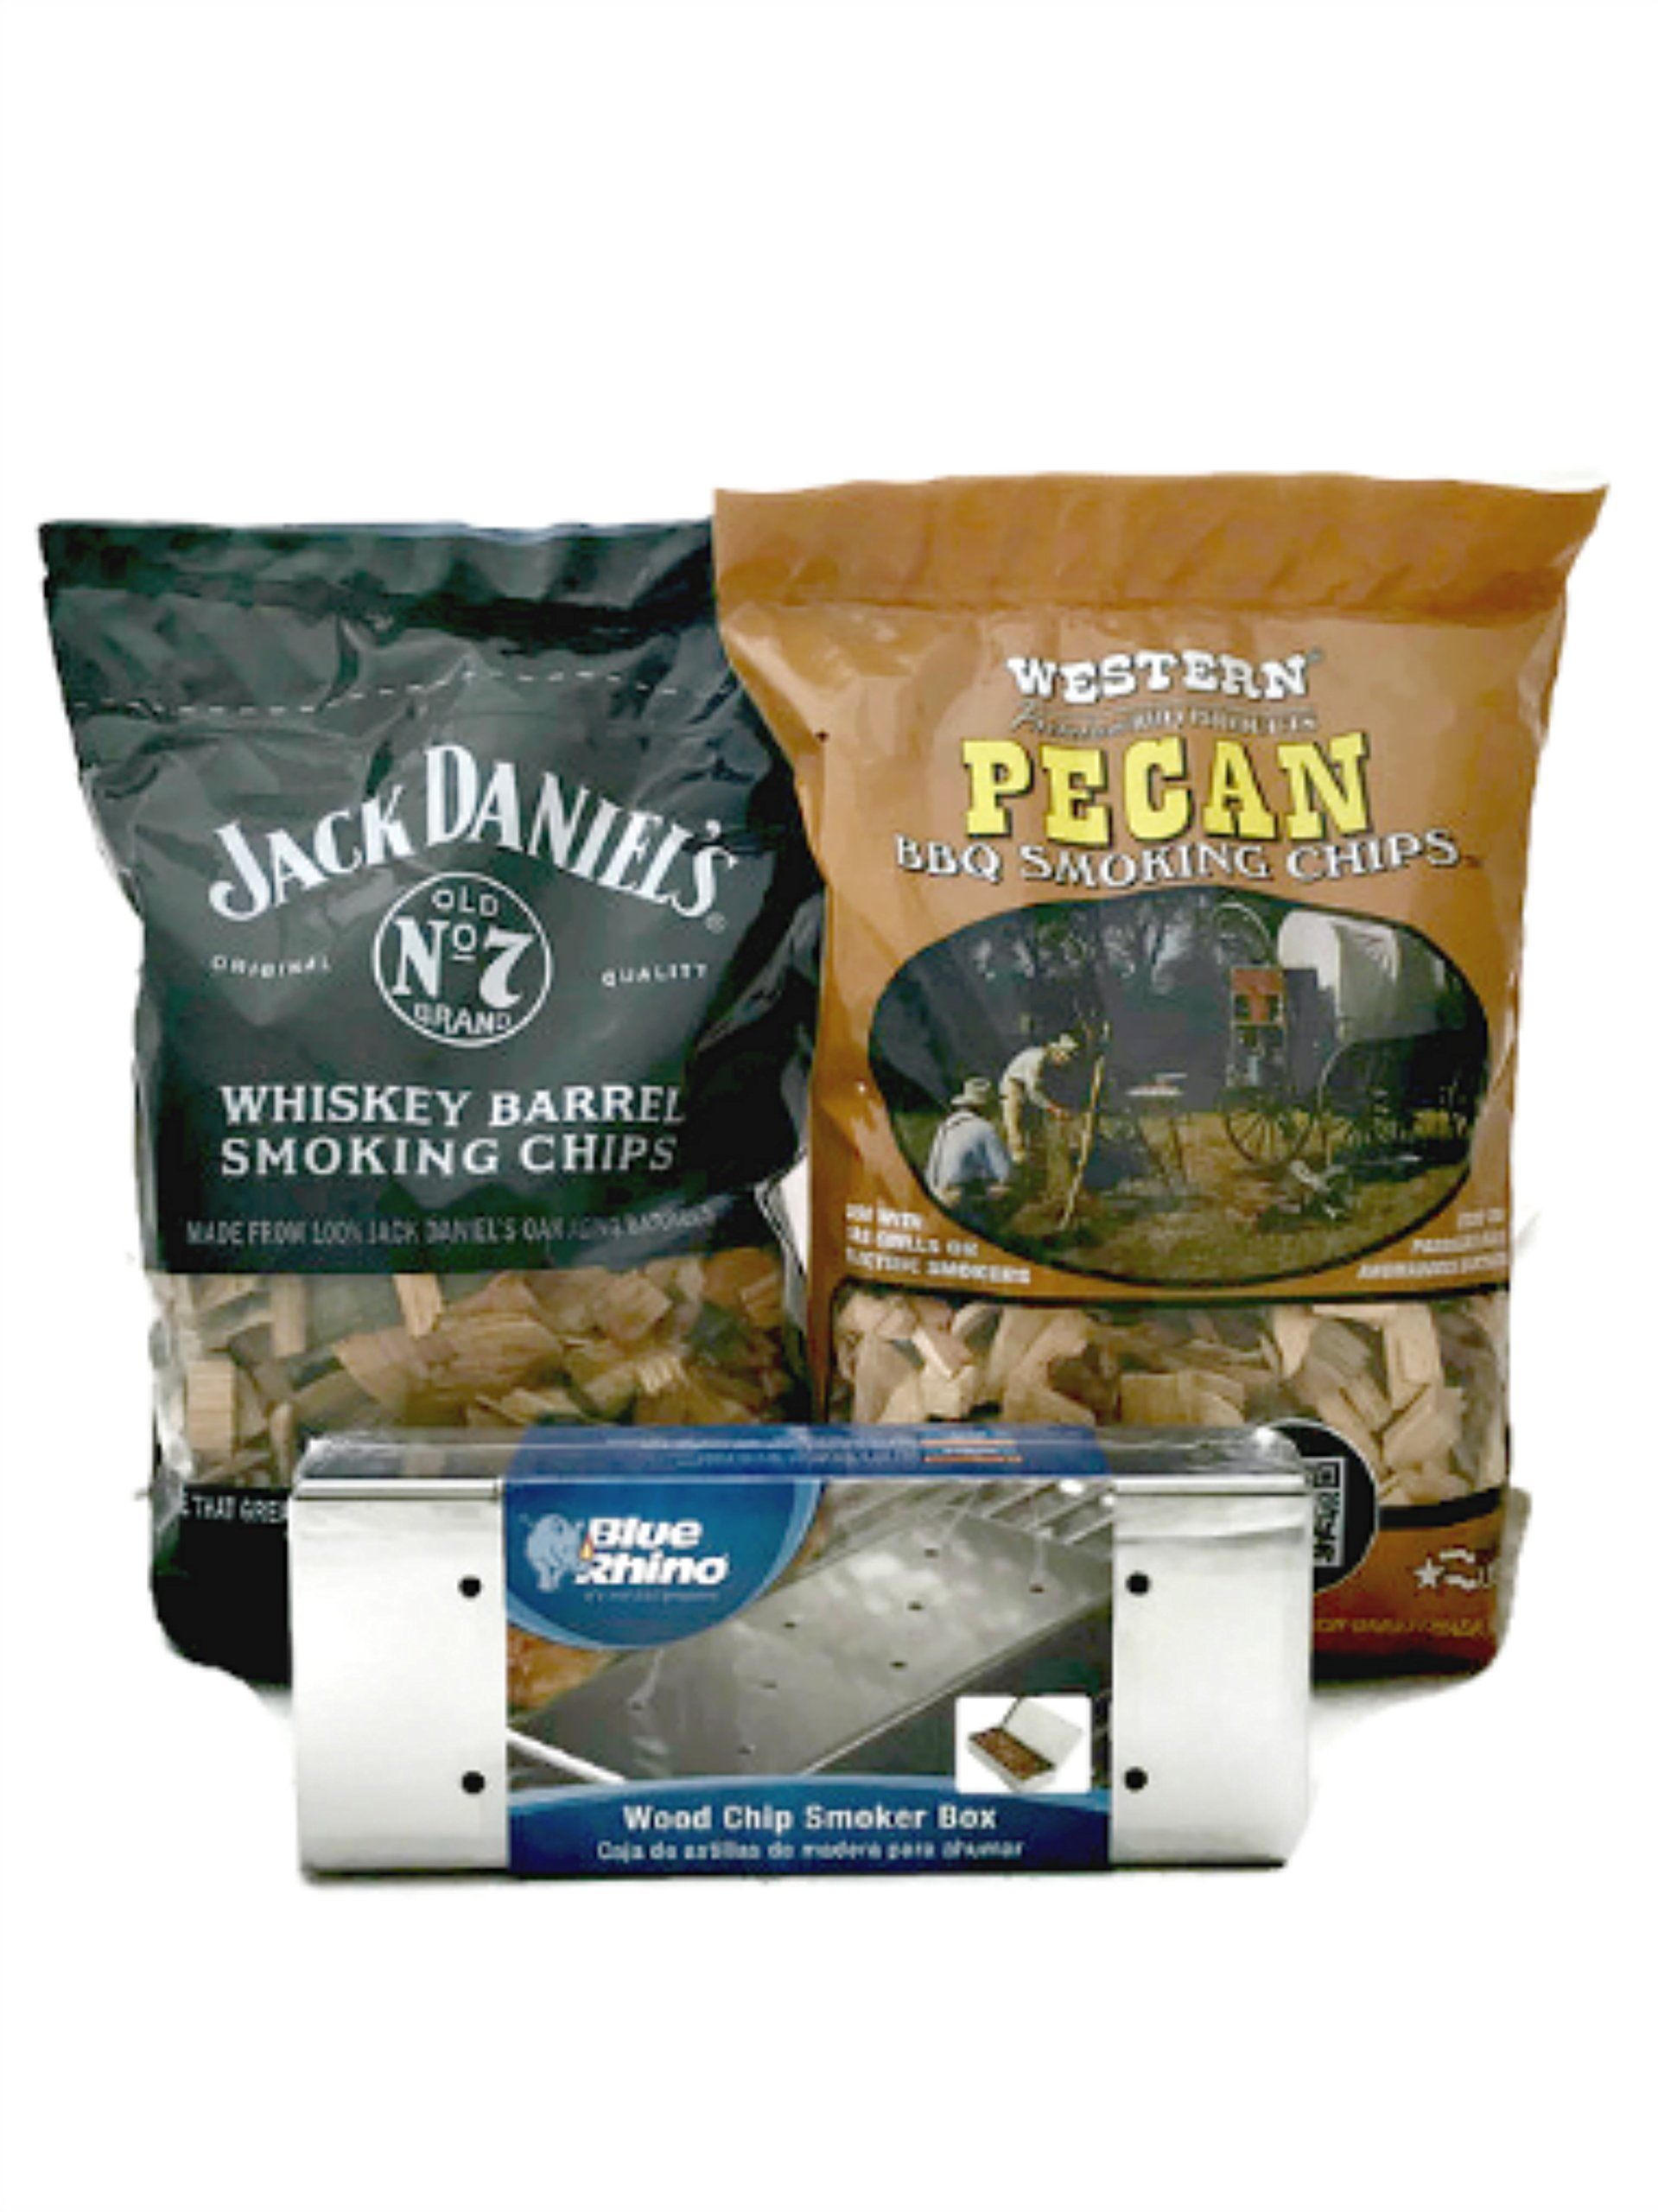 Smokin Grillin Bundle of 3: Blu Rhino Wood Chip Smoker Box, One Bag Jack Daniels Whiskey Barrel Smoking Chips and One Bag Western Pecan BBQ Smoking Chips by Blue Rhino, Jack Daniels and Western Cowboy